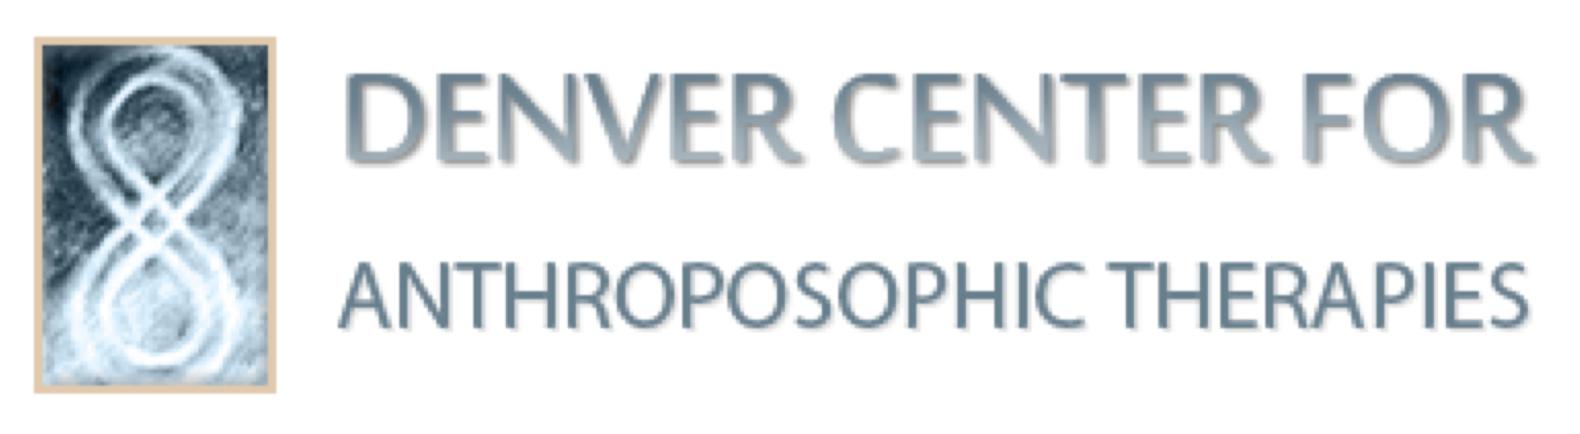 Denver Center for Anthroposophic Therapies